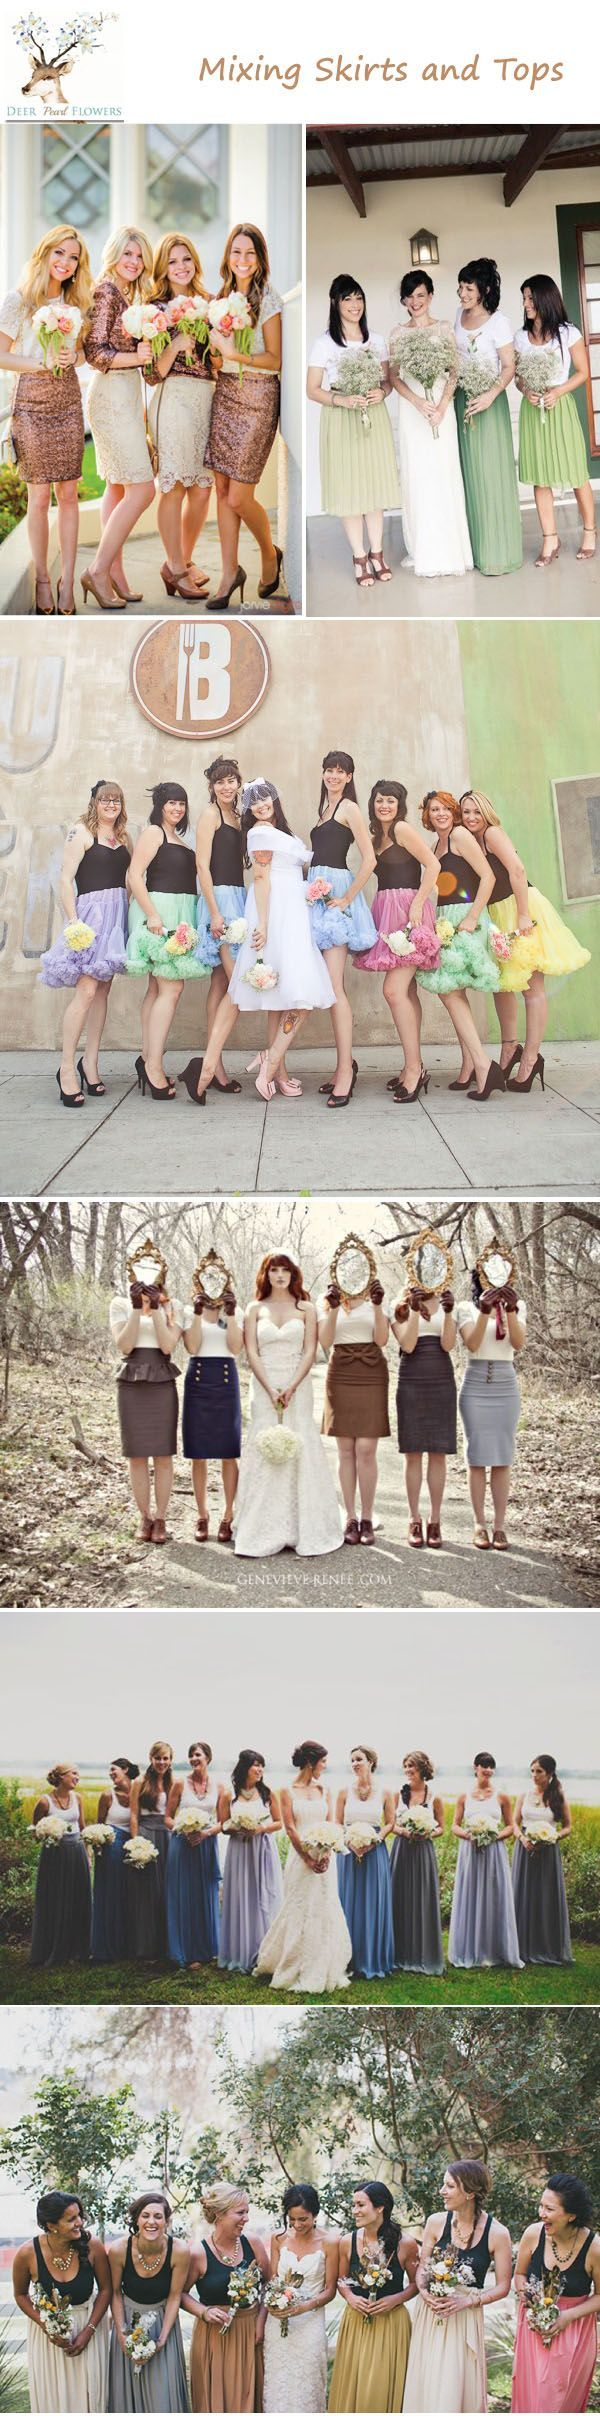 unique bridesmaid dress ideas - mixing skirts and tops mismatched bridesmaid dress